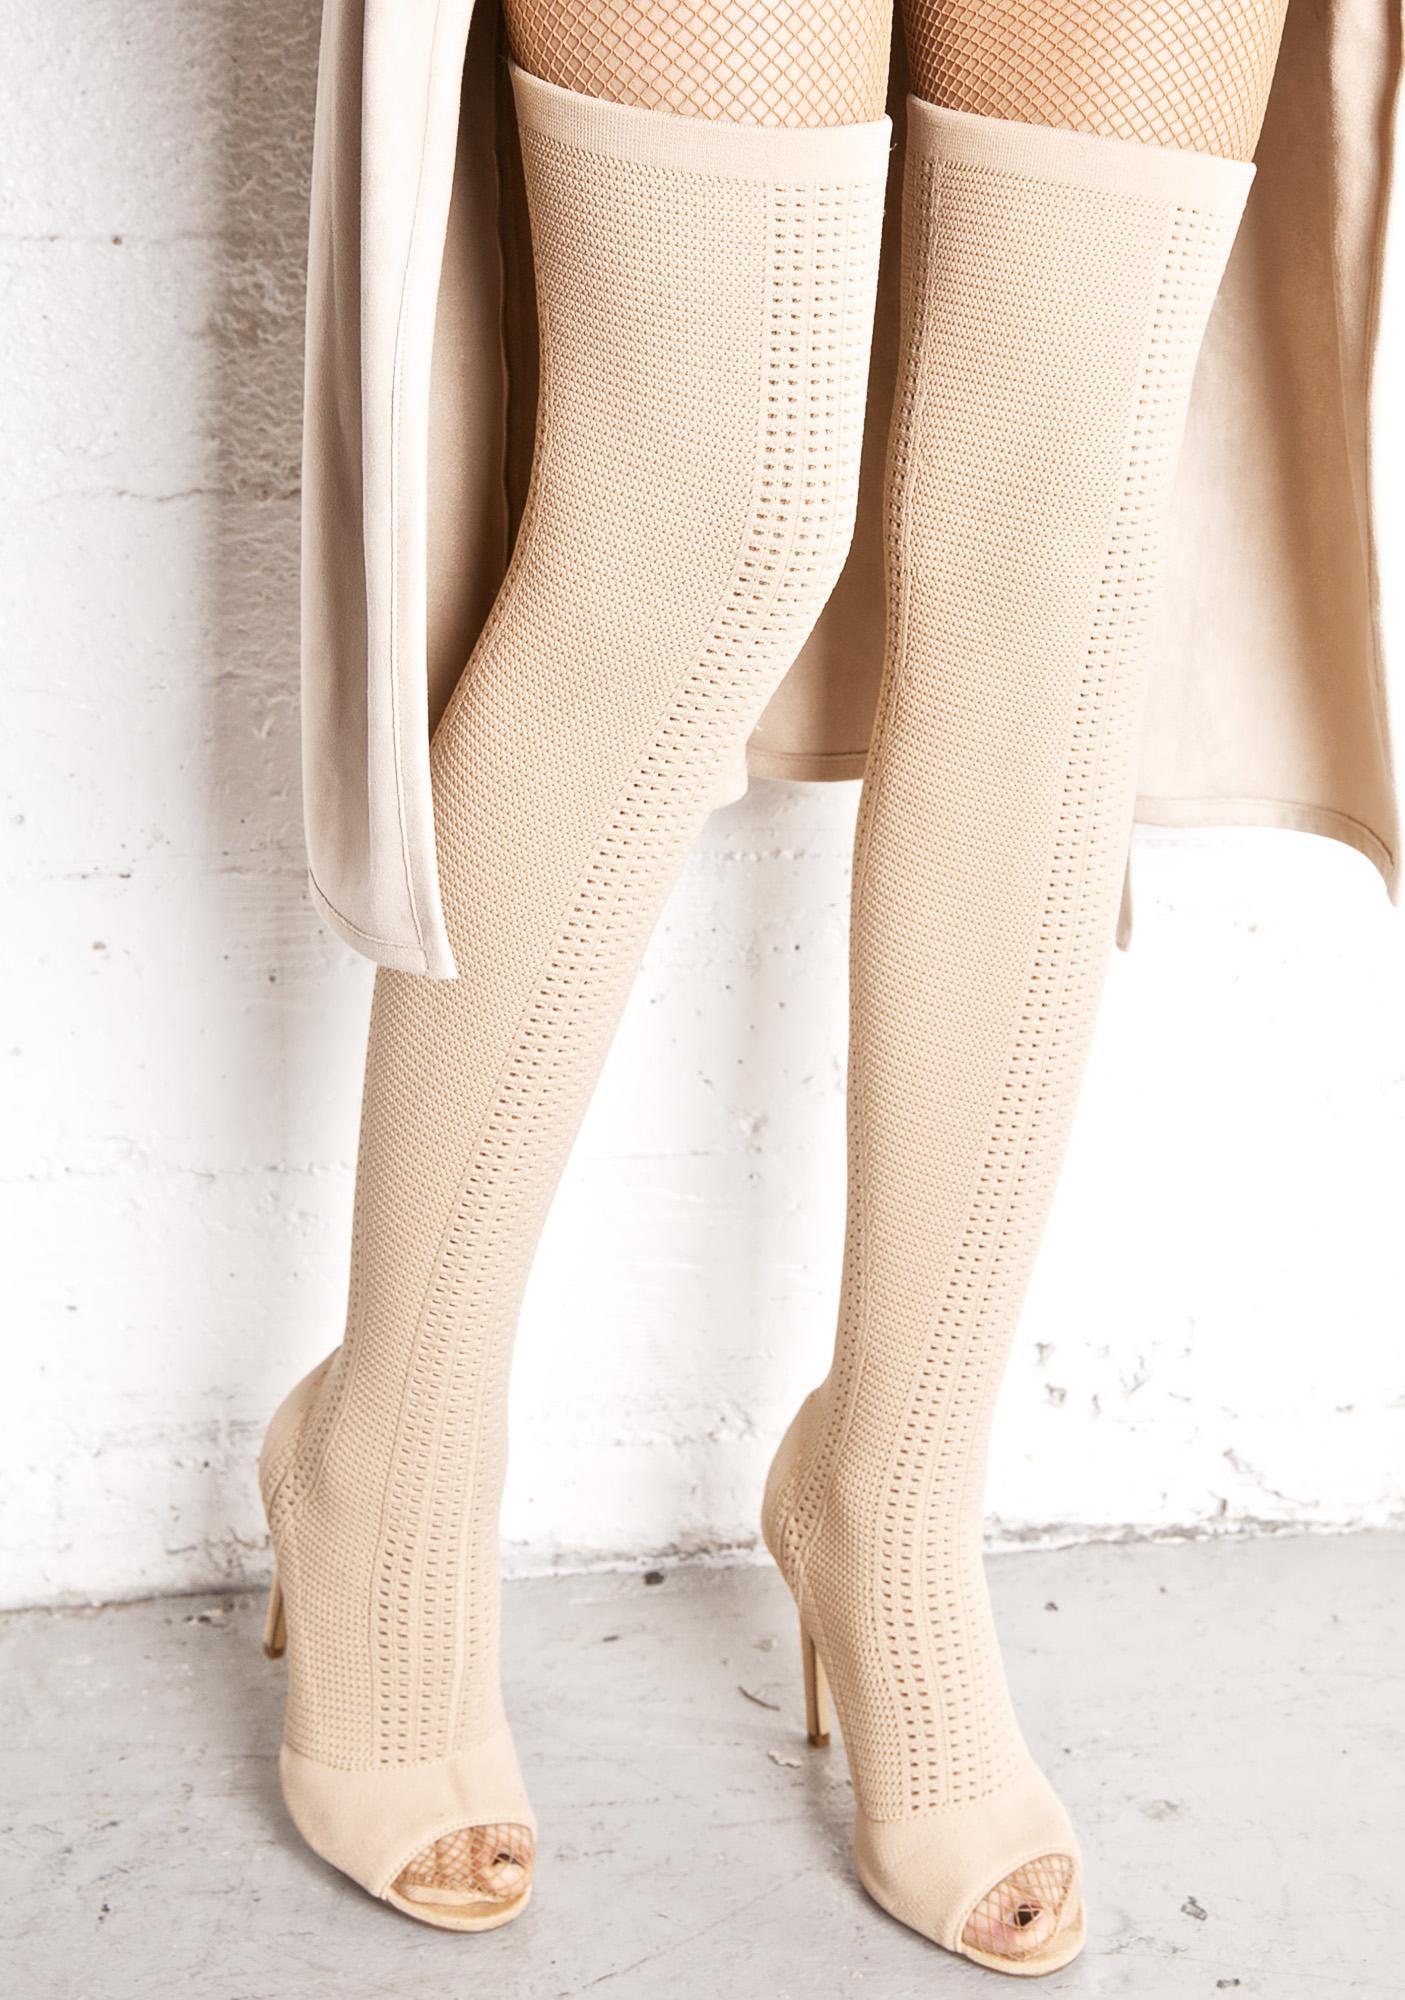 Myth Thigh-High Sock Boots